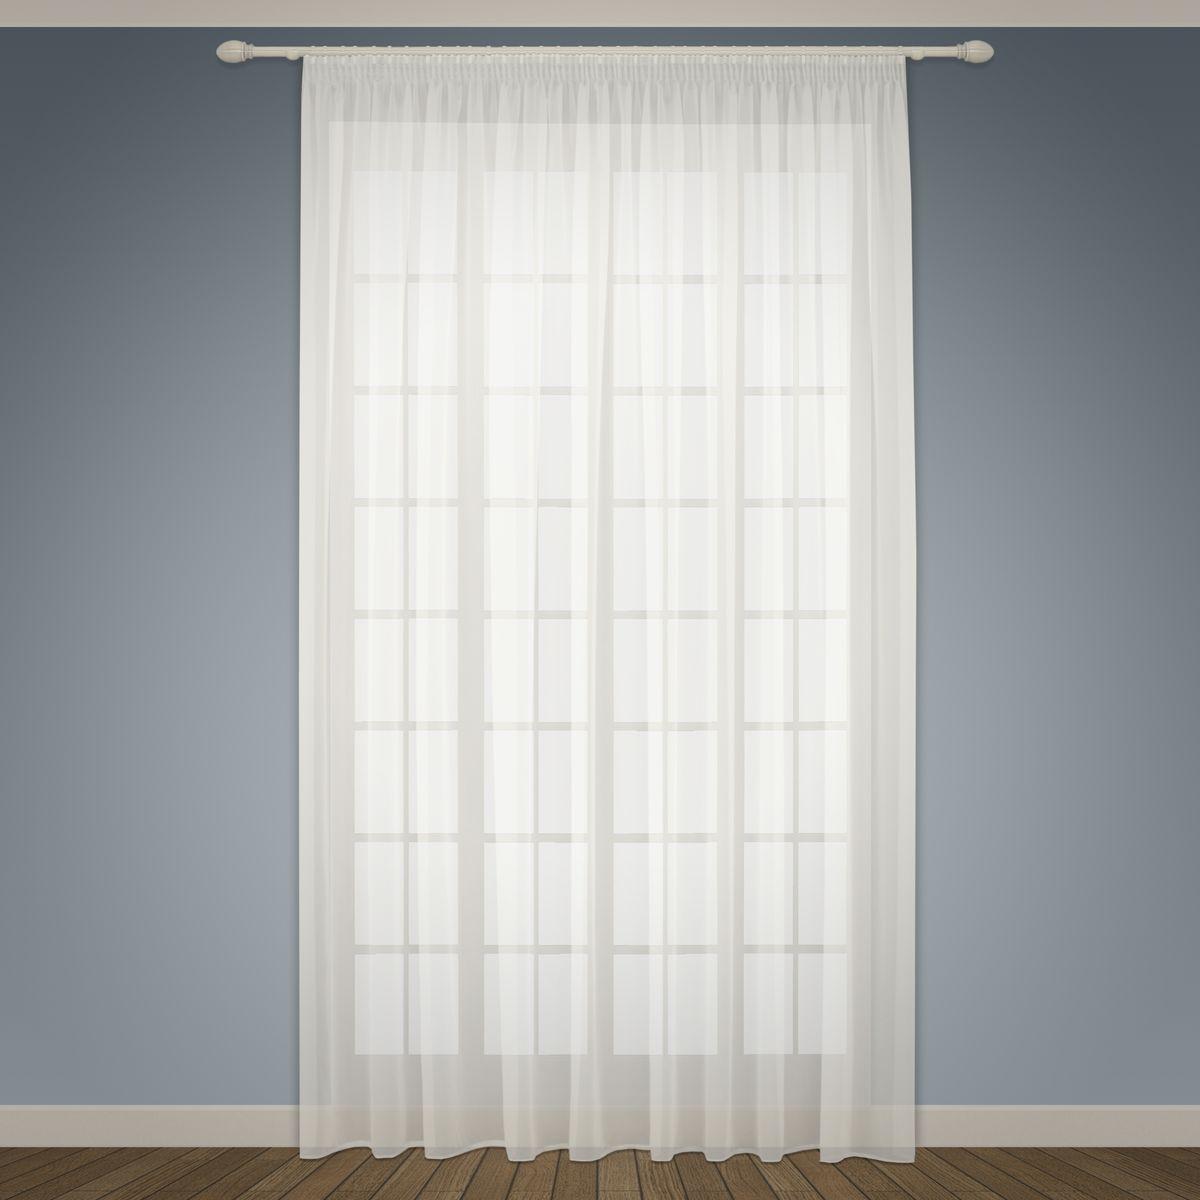 Тюль Sanpa Home Collection Аманда, на ленте, цвет: белый, высота 280 смHP vual/1585/1E Аманда белый, , 500*280 см